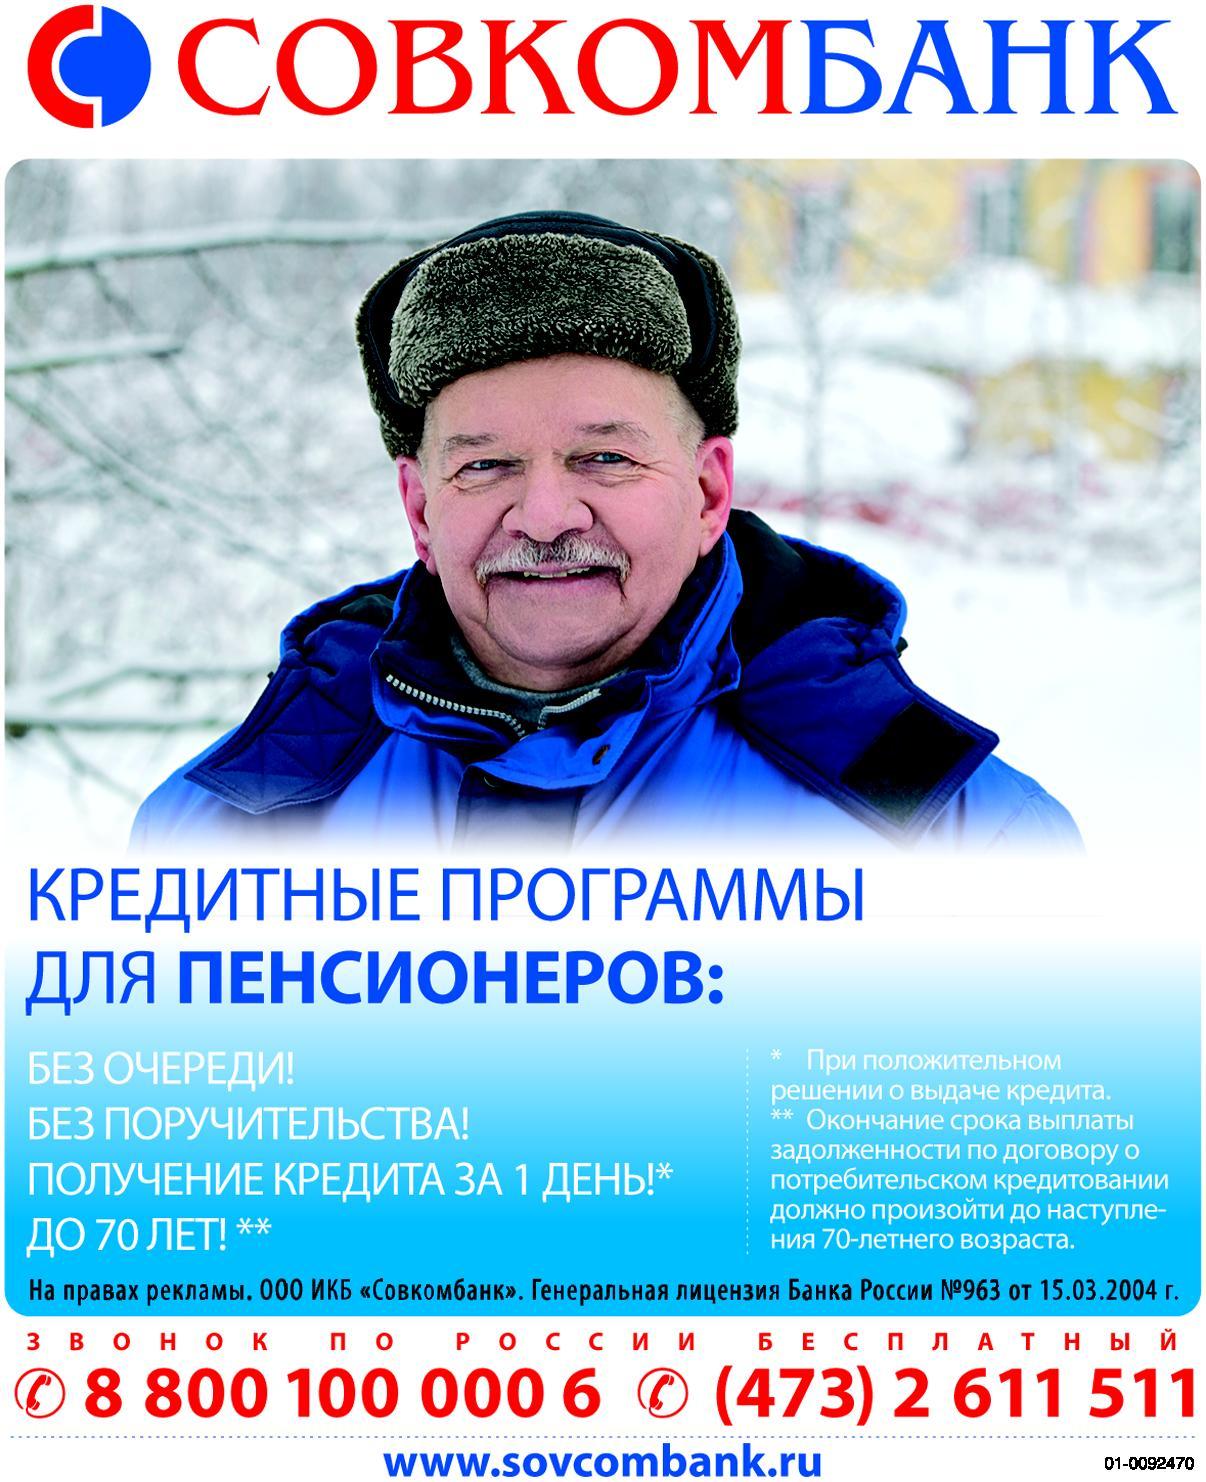 Займы с 18 лет в Казахстане, взять займ онлайн (online) с